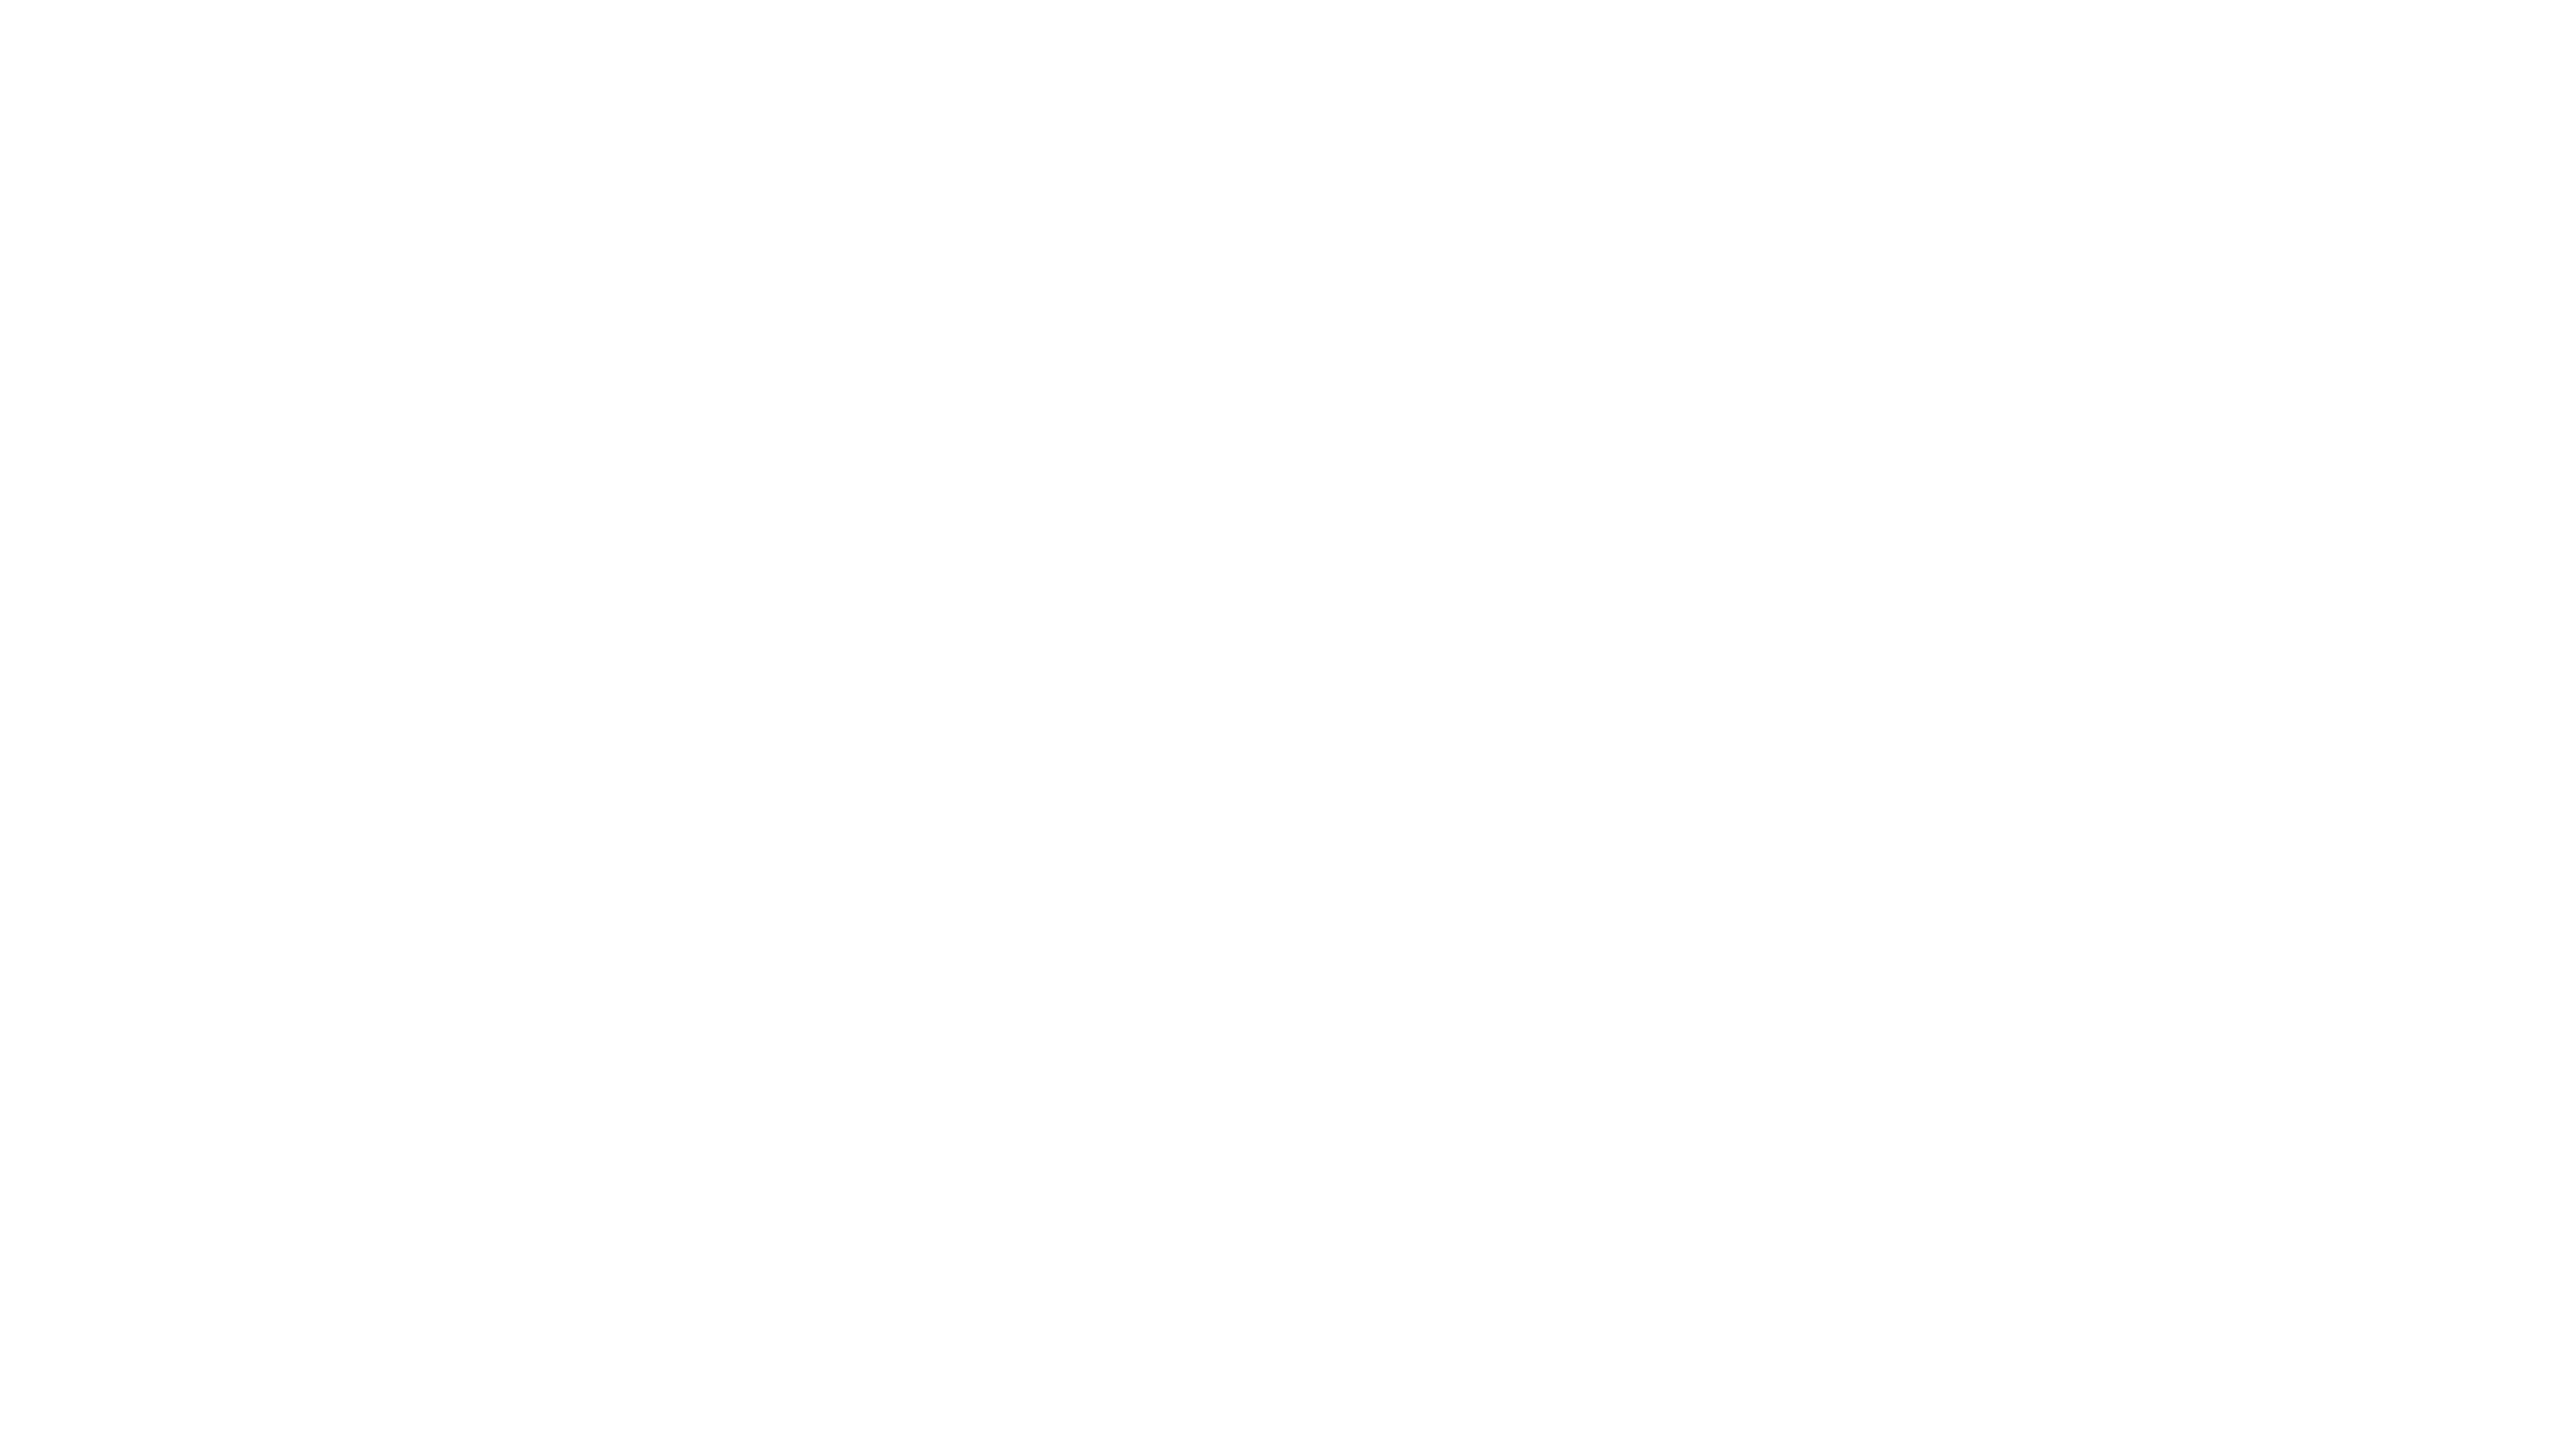 Astrollum Films